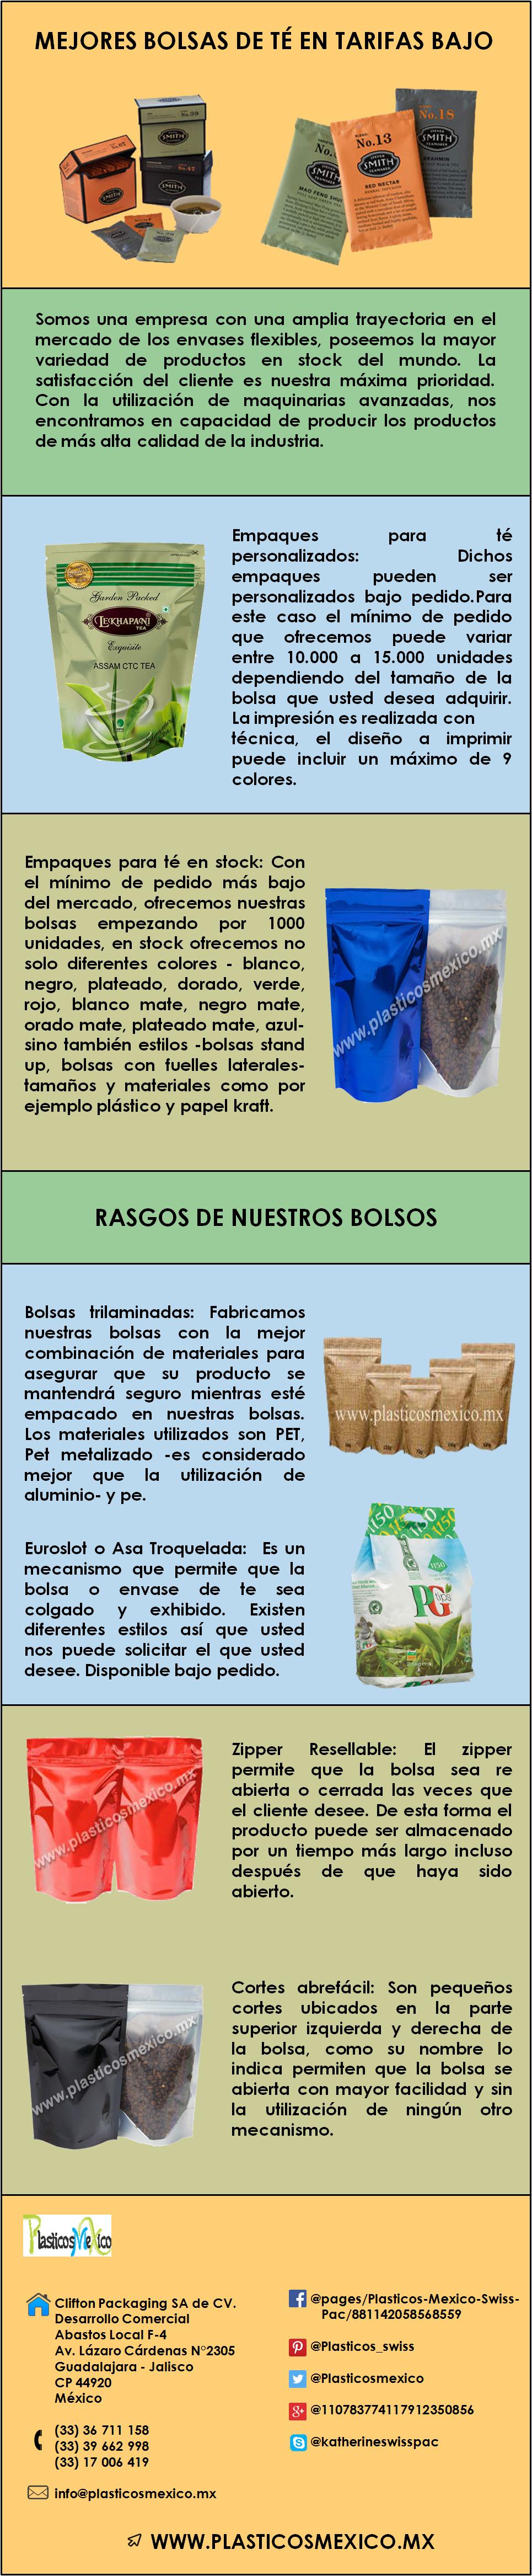 Bolsas para Té - Bolsas de té de calidad